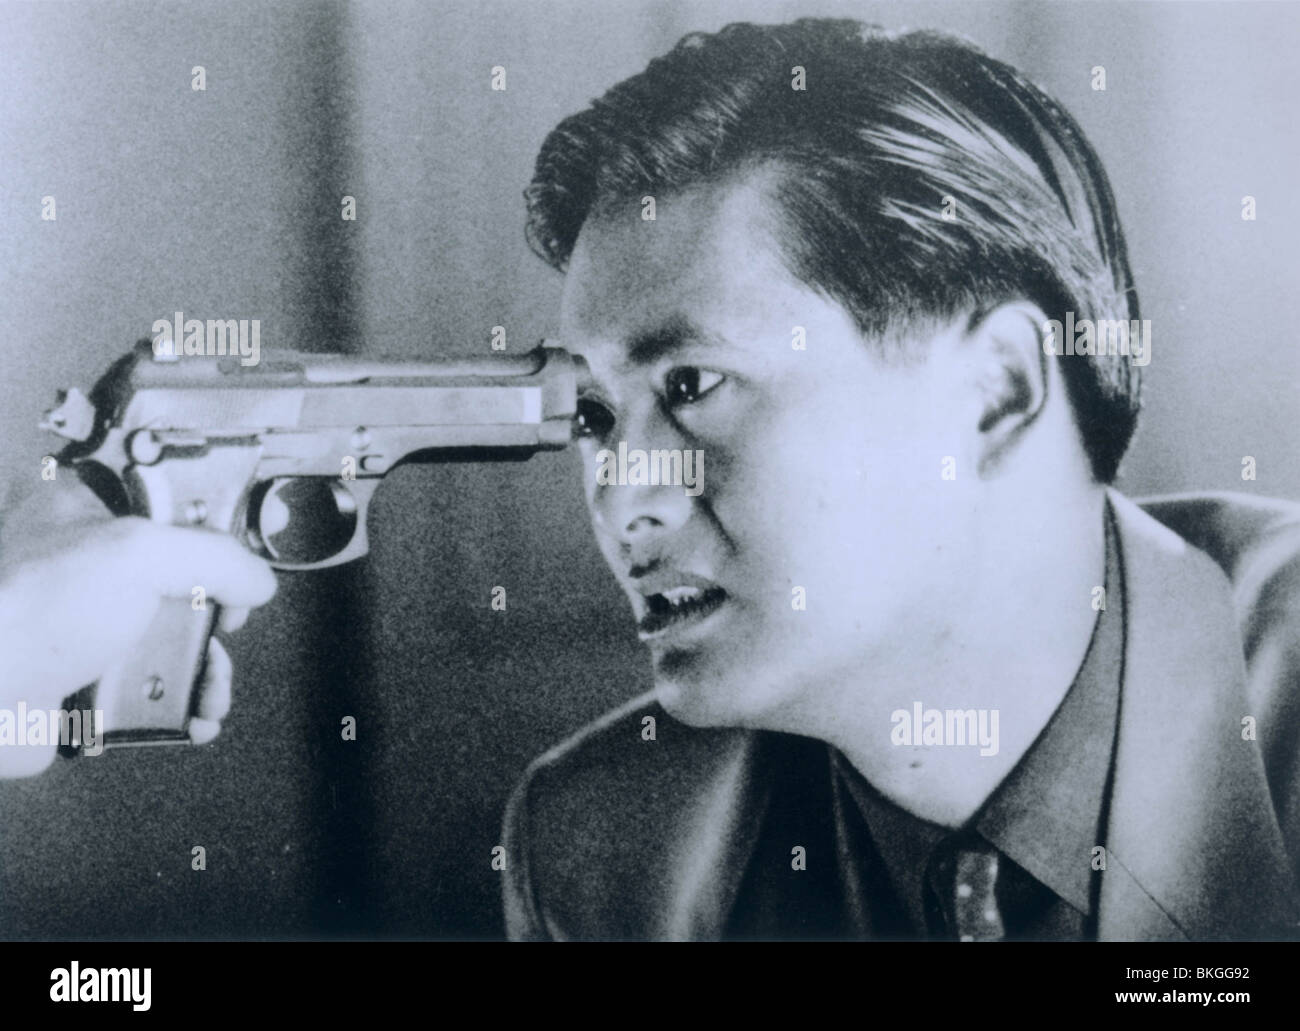 Il killer -1989 Chow Yun Fat Immagini Stock